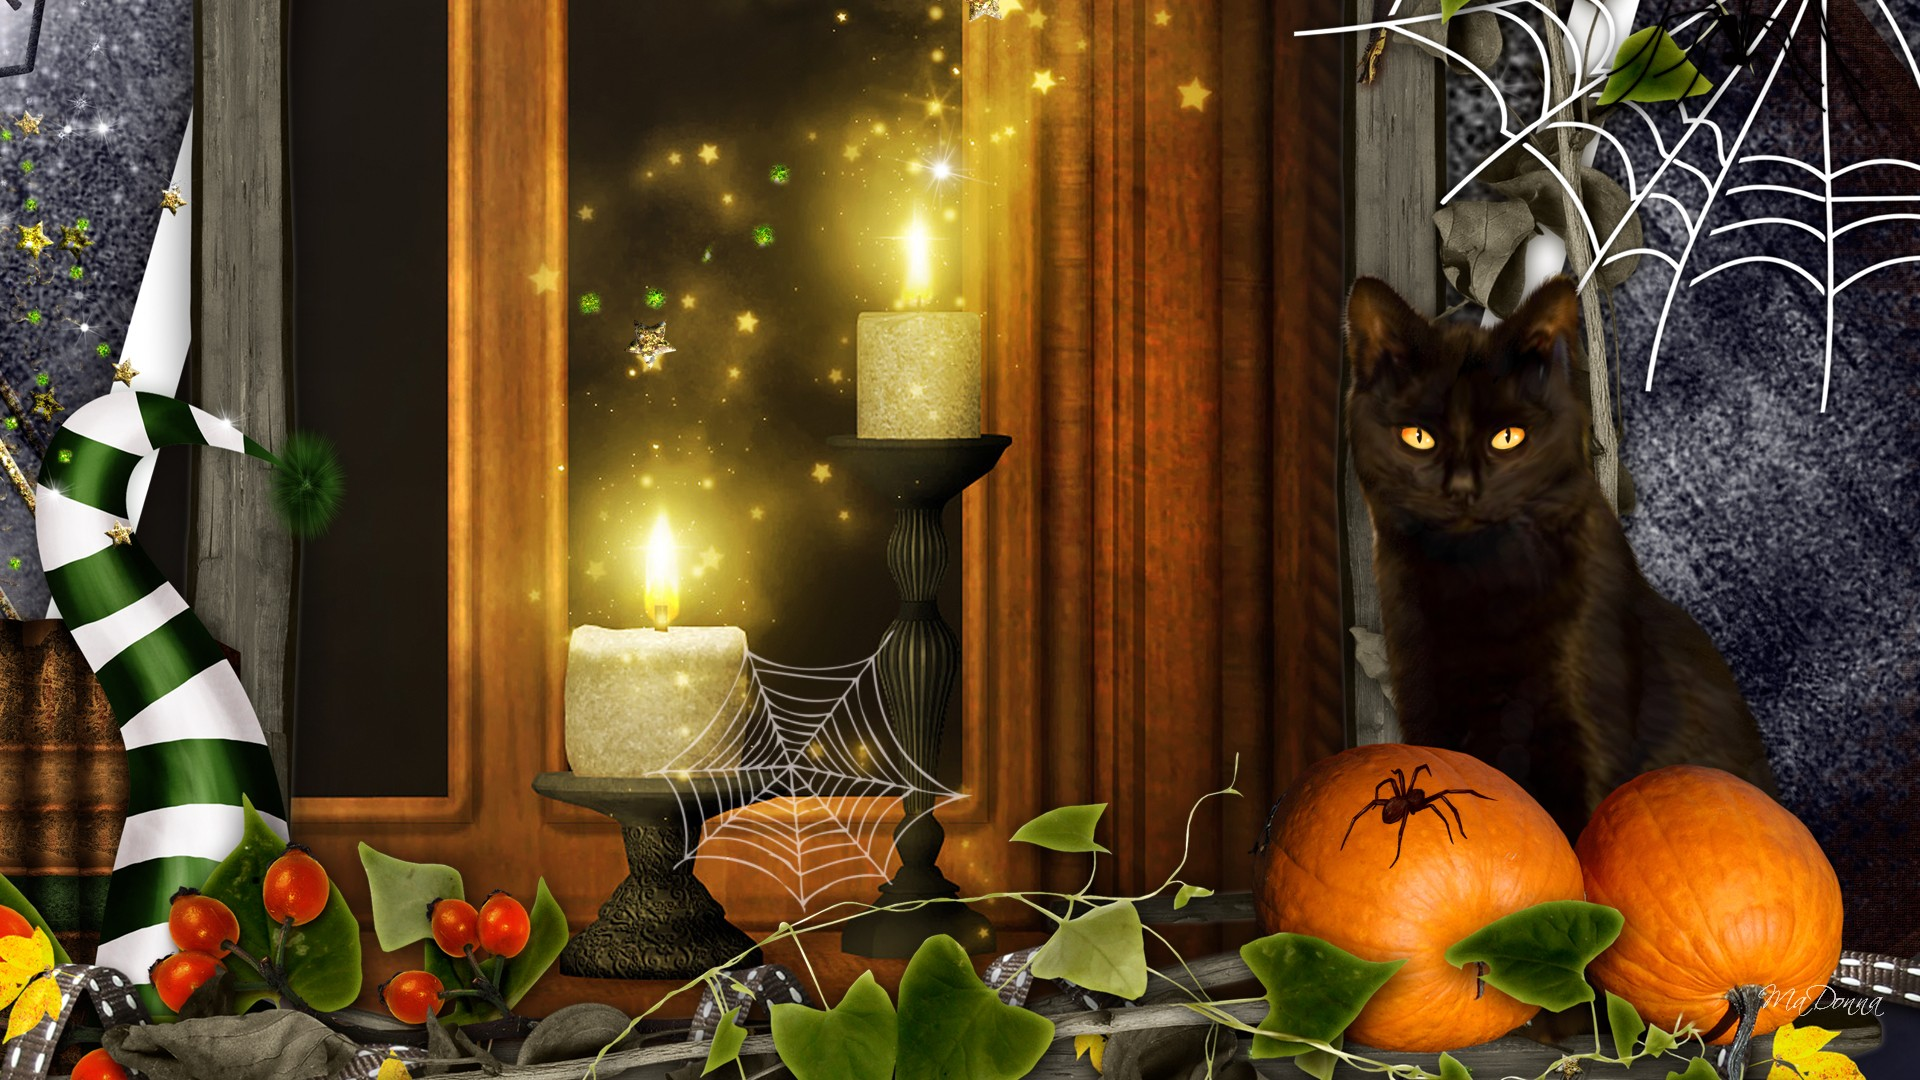 Halloween hd wallpaper background image 1920x1080 id 739648 wallpaper abyss - Free widescreen halloween wallpaper ...